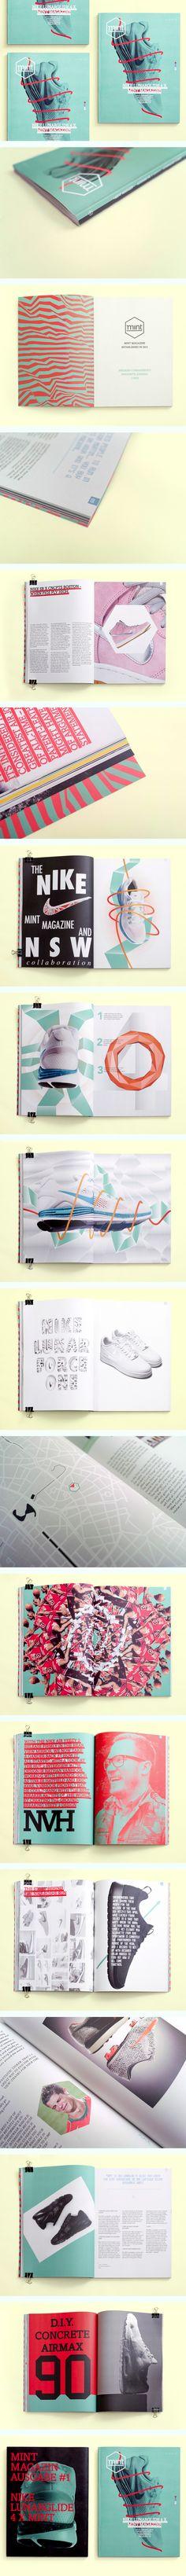 [Editorial Design Served'] MINT Magazine // Sneaker Magazine by Jonas Möllenbeck